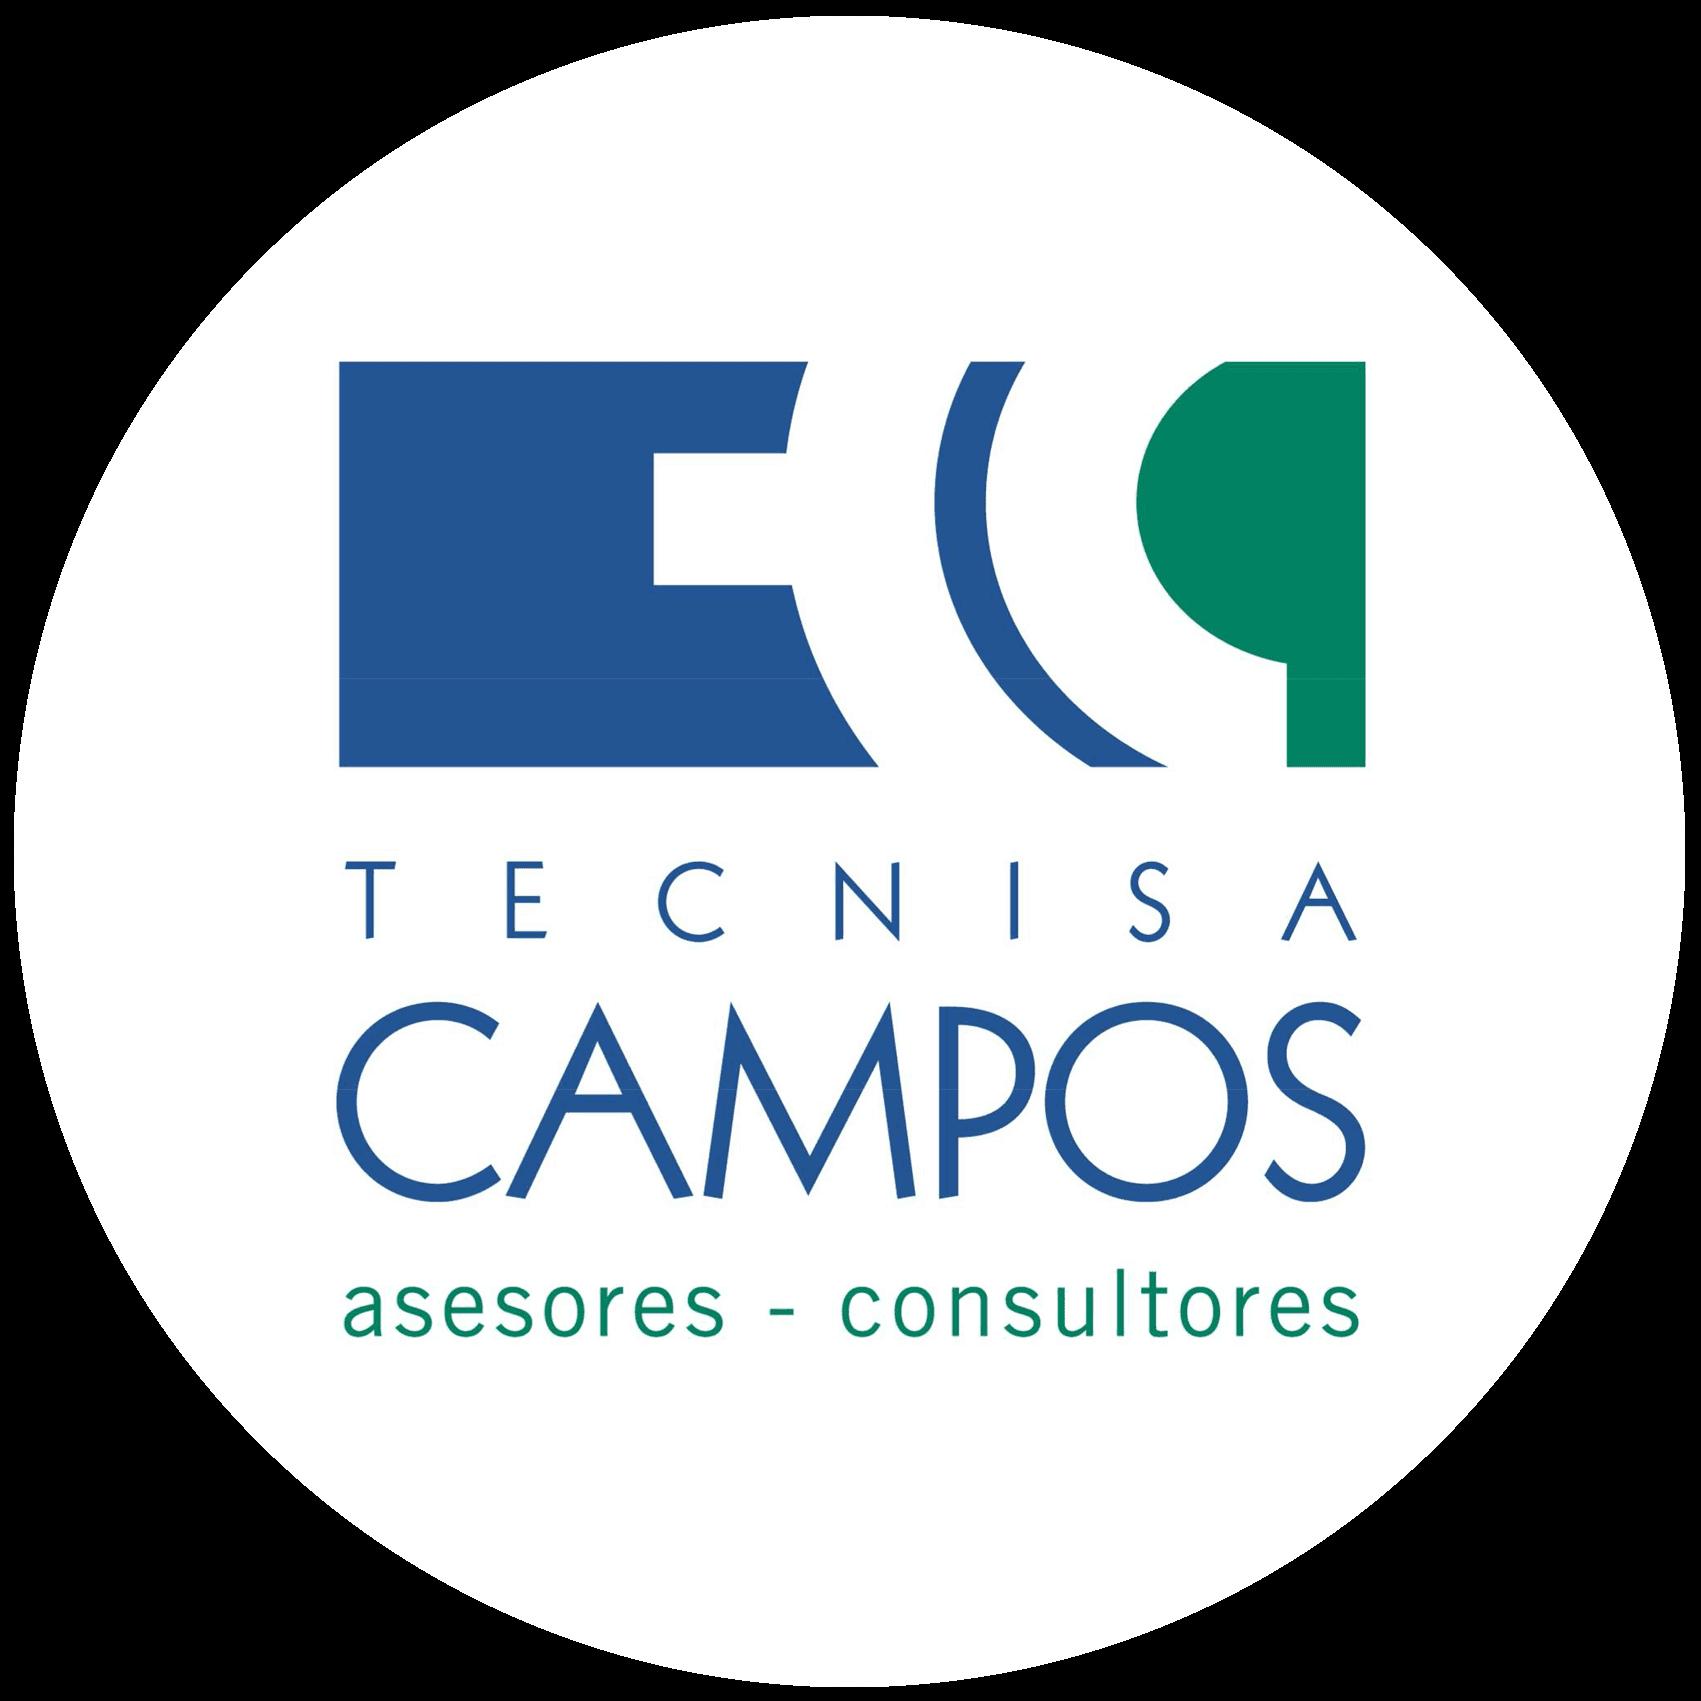 Tecnisa Campos